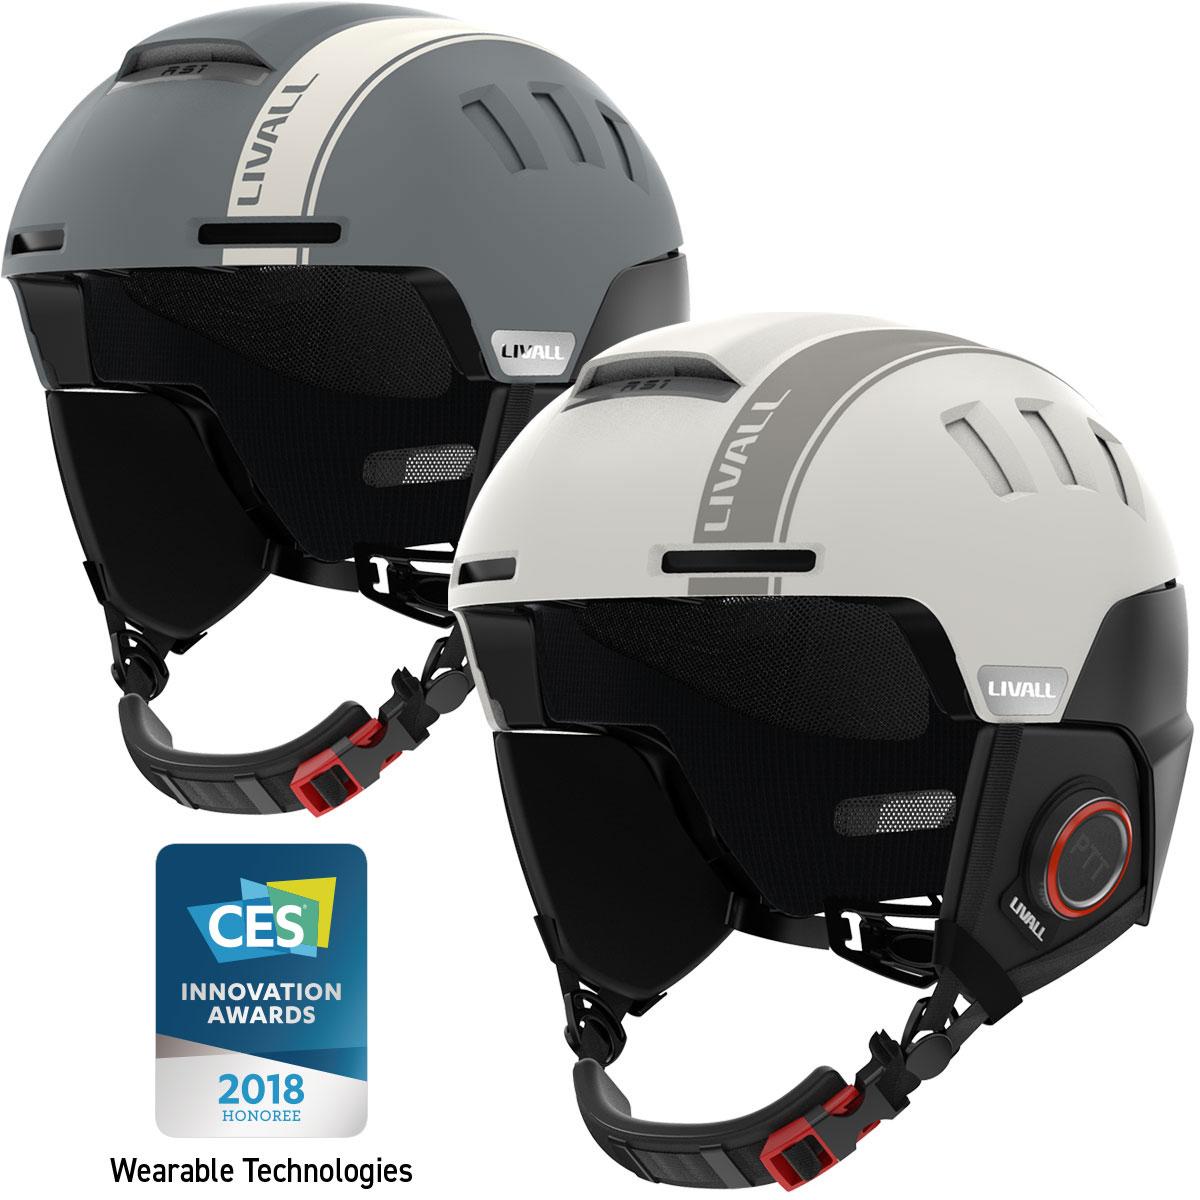 LIVALL RS1 Smart Bluetooth Ski & Snowboard Helmet | Distributors